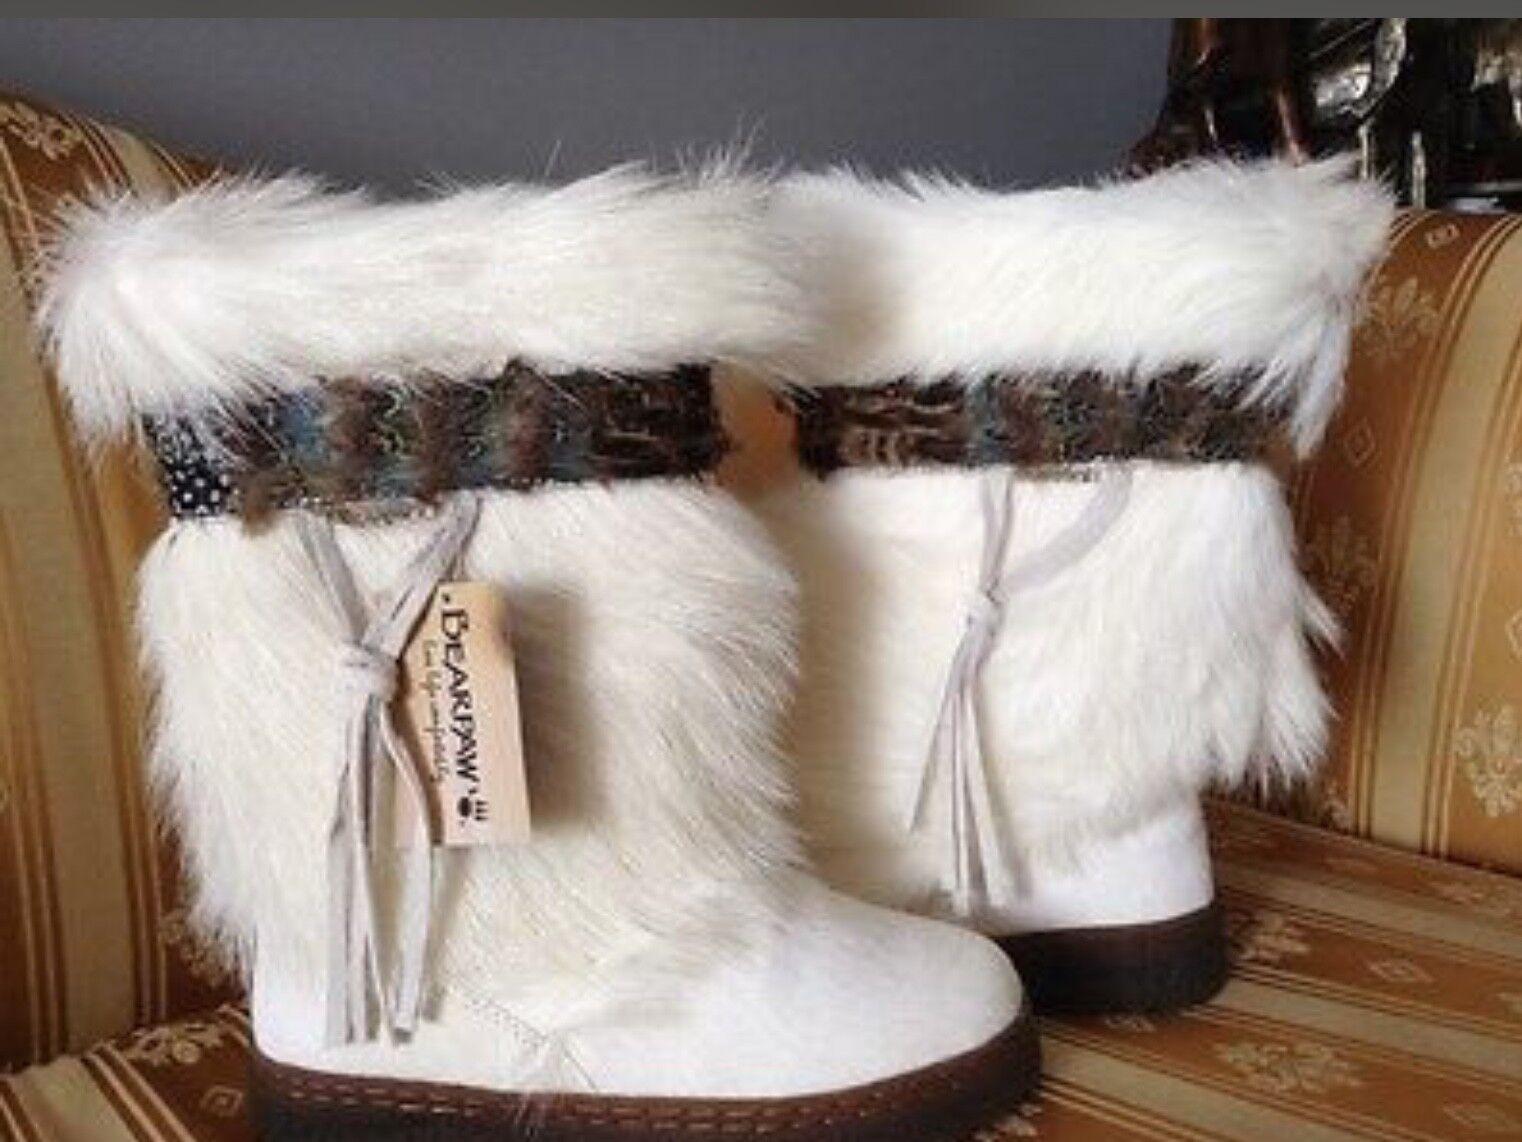 BEARPAW BEARPAW BEARPAW KOLA II BOOTS Goat FUR SHEEPSKIN Après Ski WHITE 7M (6-6.5M) edbed0